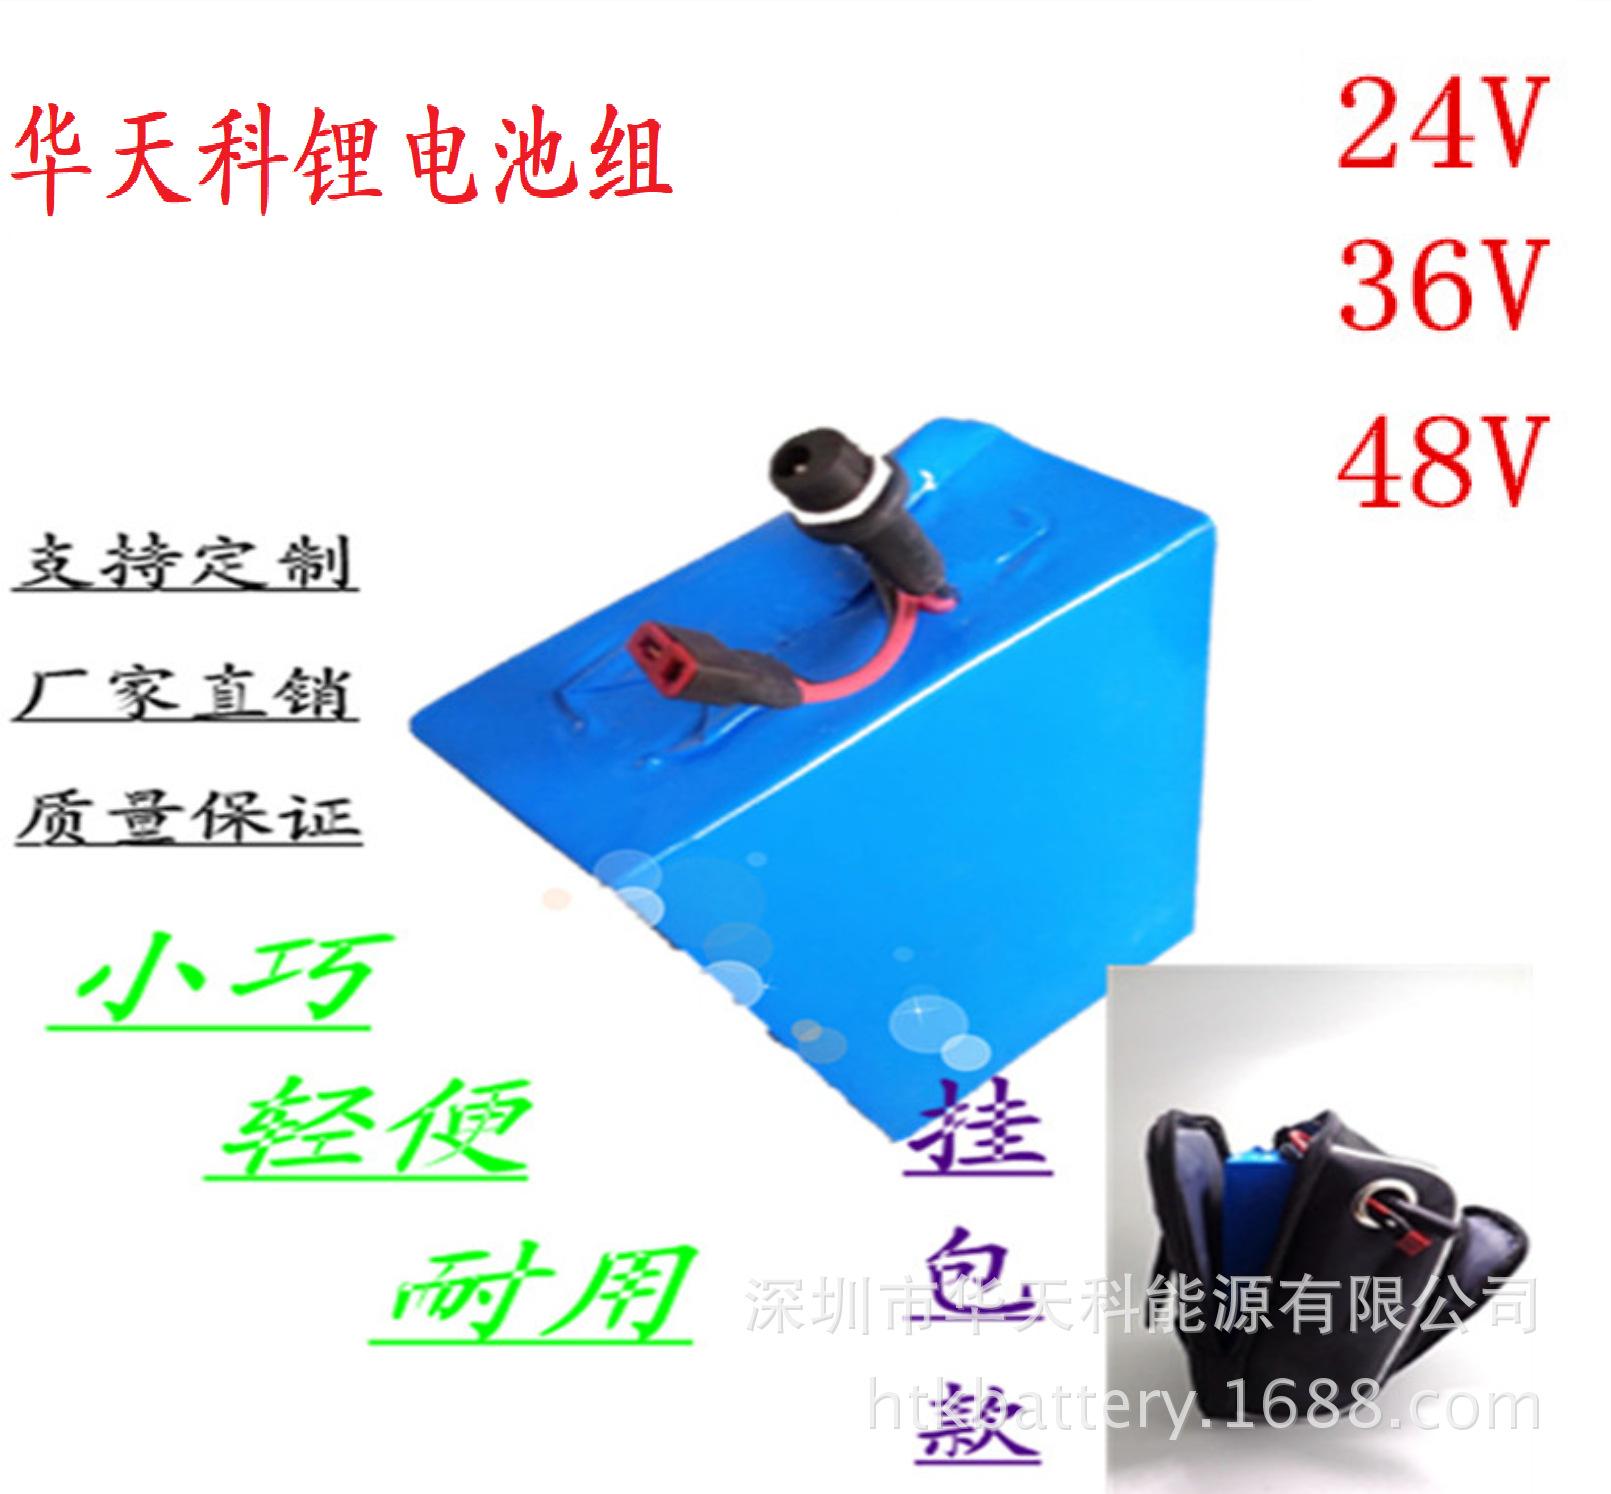 厂家直销24V36V48V8AH10AH12AH15AH18AH20AH电动自行车锂电池